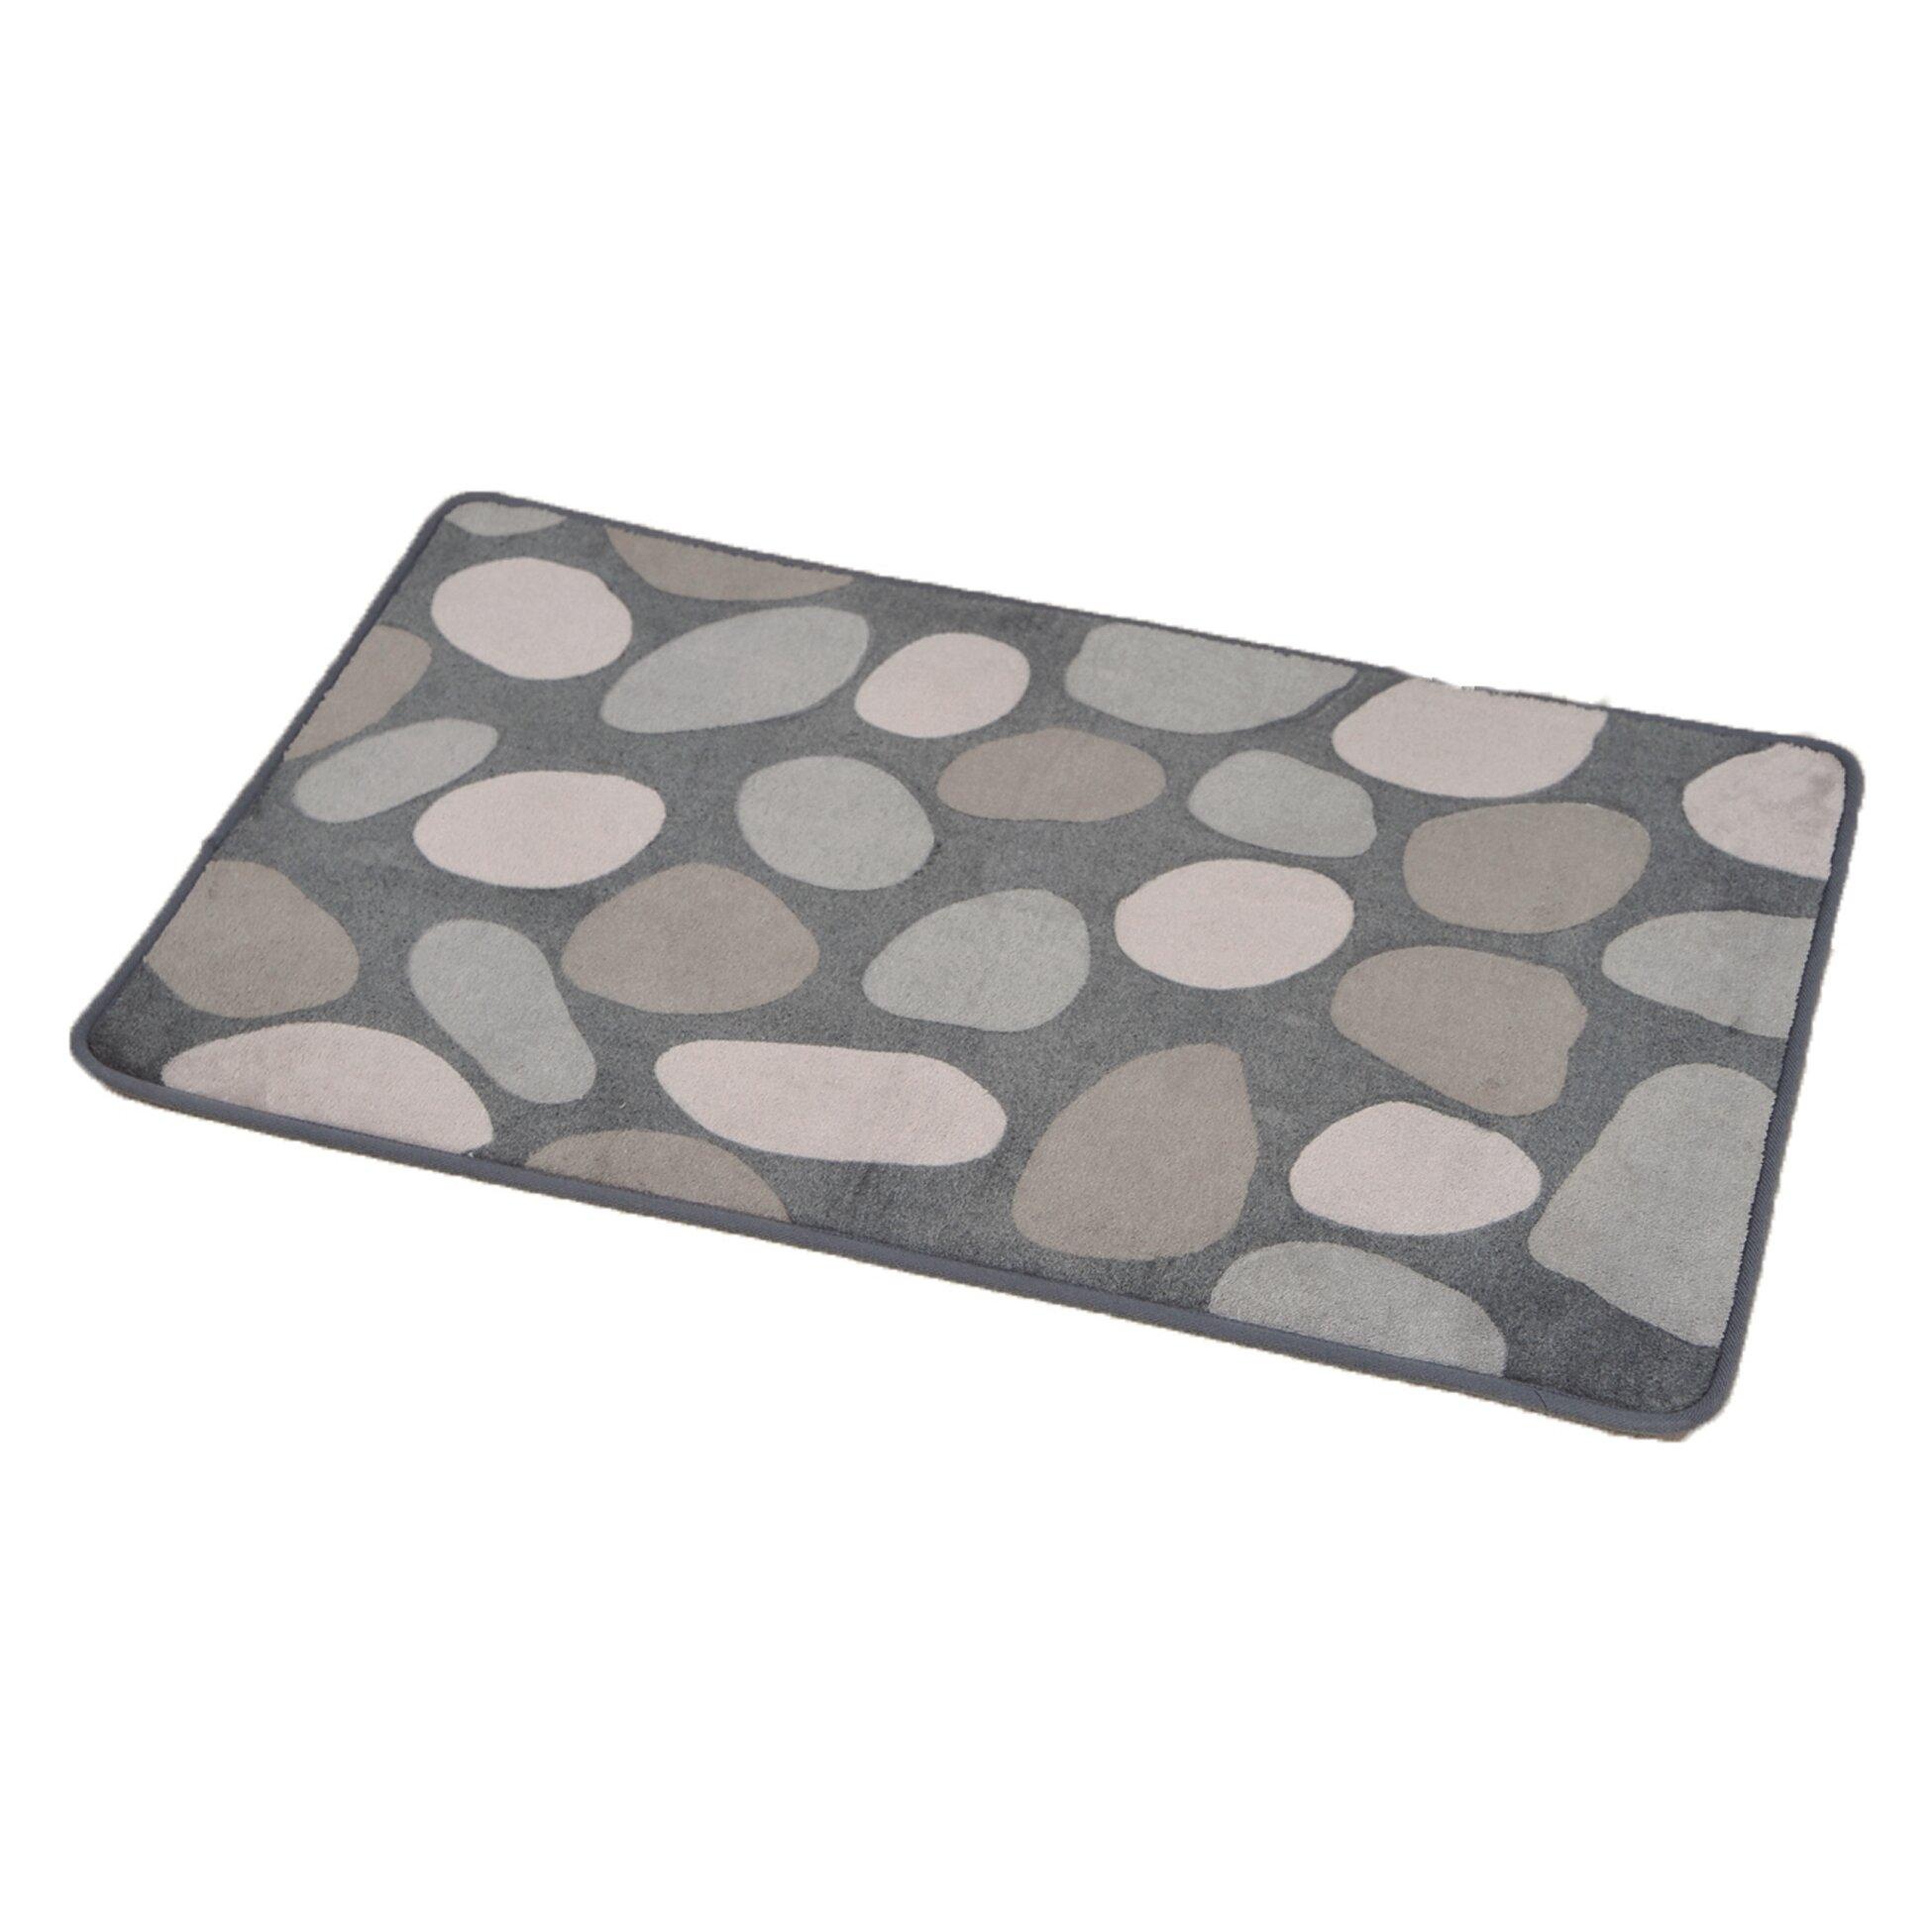 Evideco Spa Non Skid Print Bath Rug